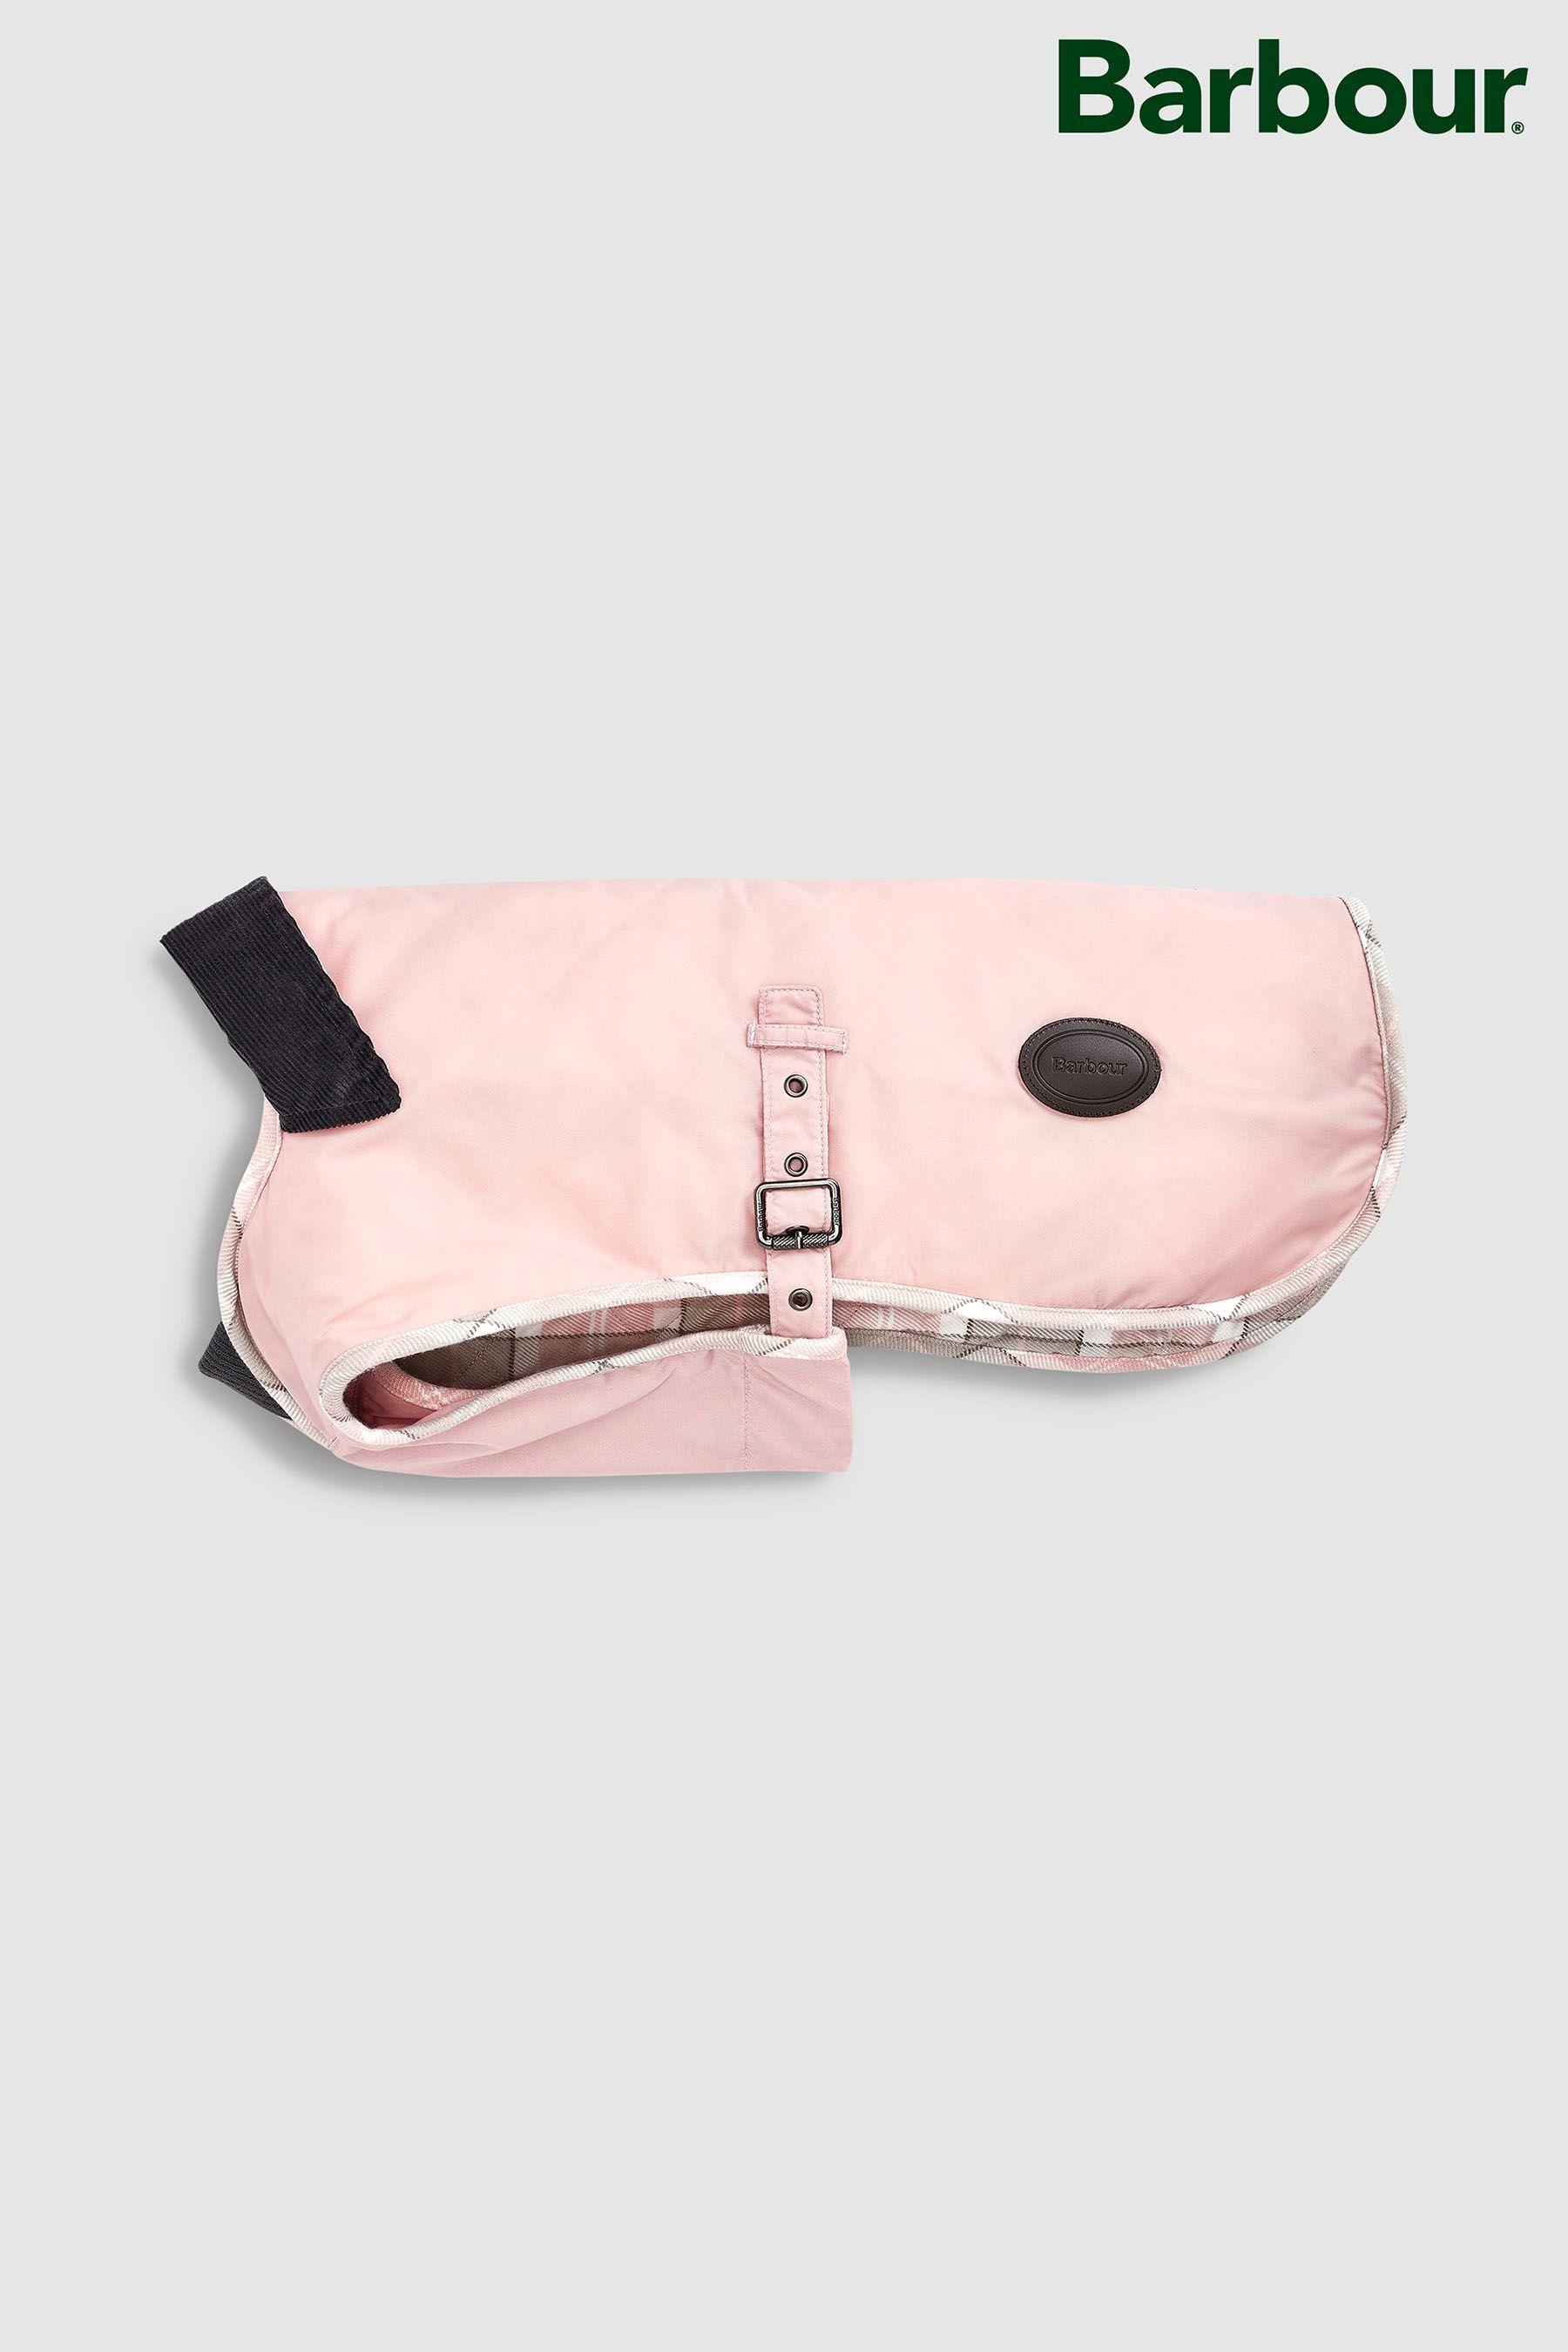 pink dog barbour coat